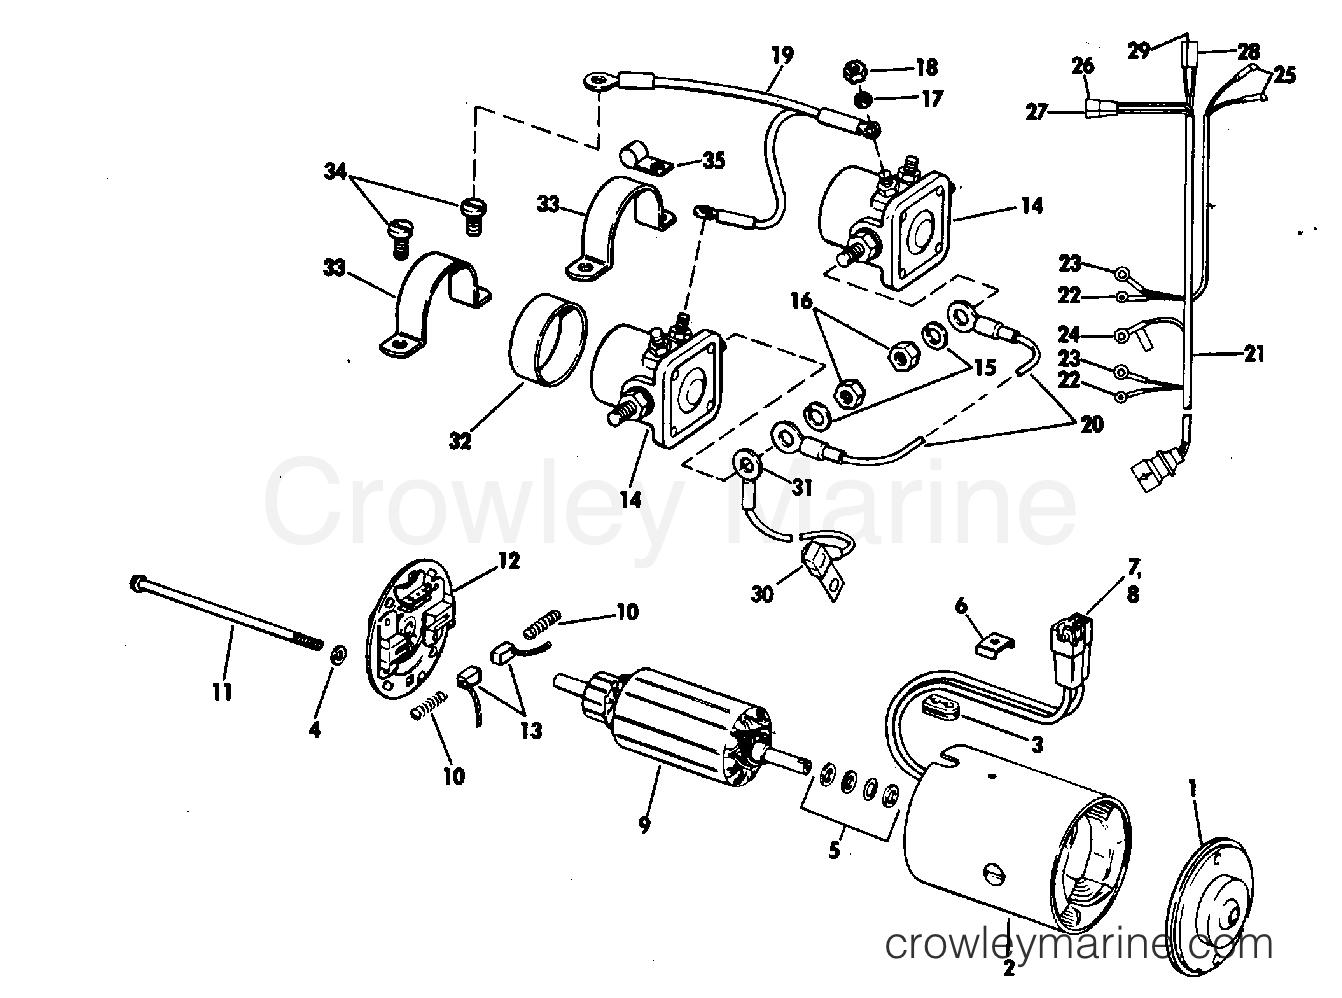 Omc Sterndrive Wiring Diagram Mazda Protege Headlight